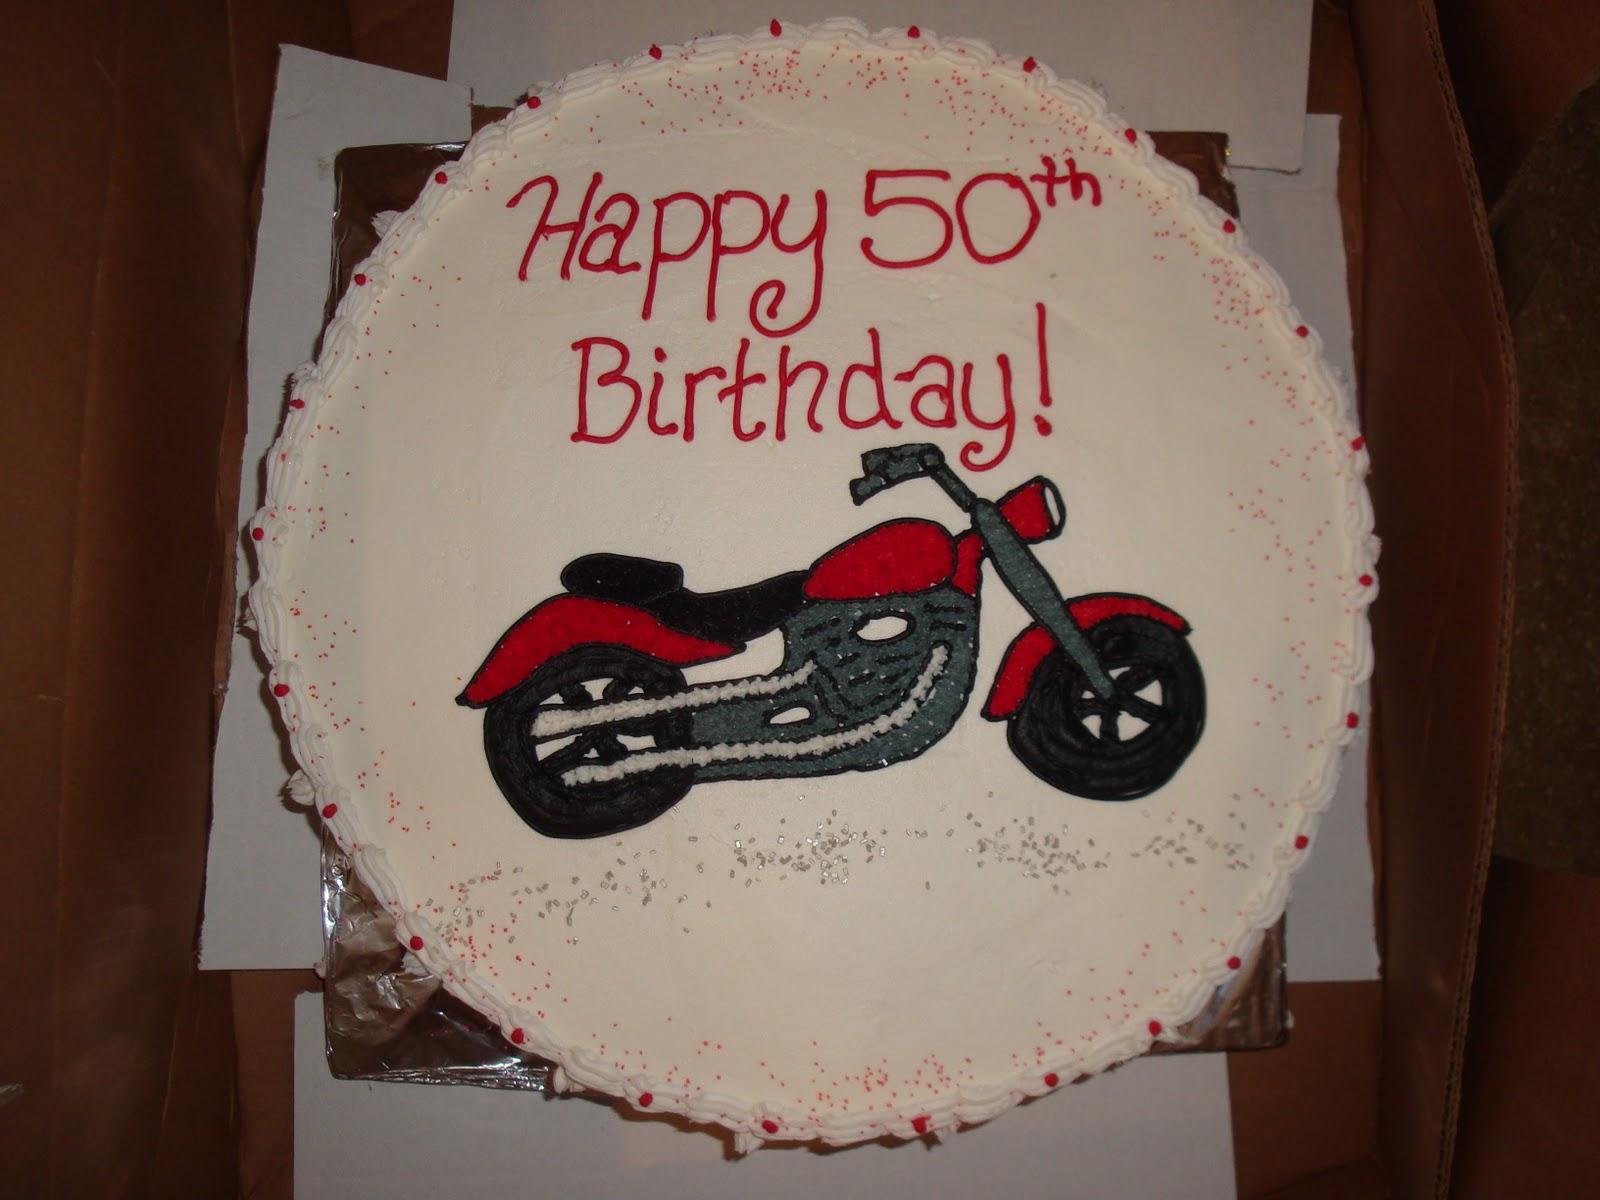 Slug Bug Bakery Motorcycle Fanatics and 50th Birthday Parties